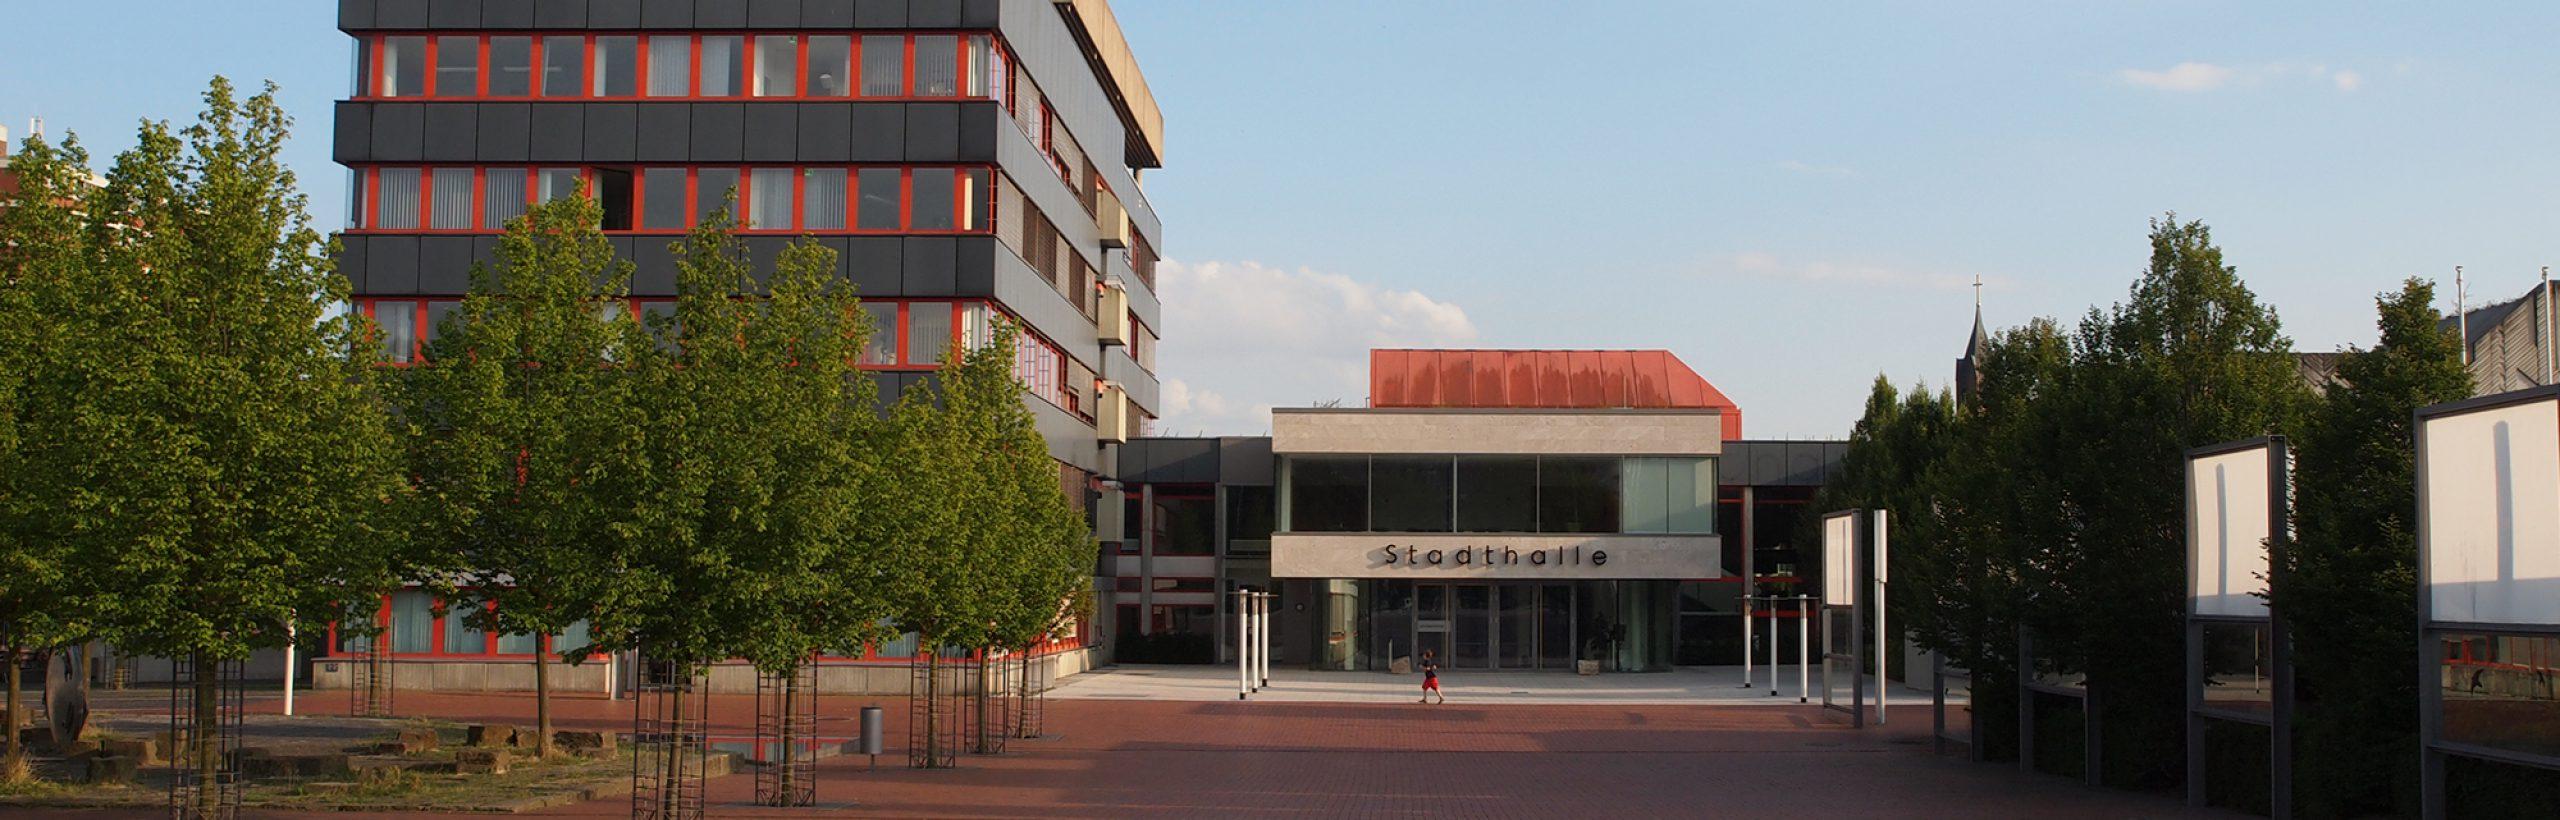 "Karrieremesse ""Perspektive"", 18. Mai, Stadthalle Baunatal"